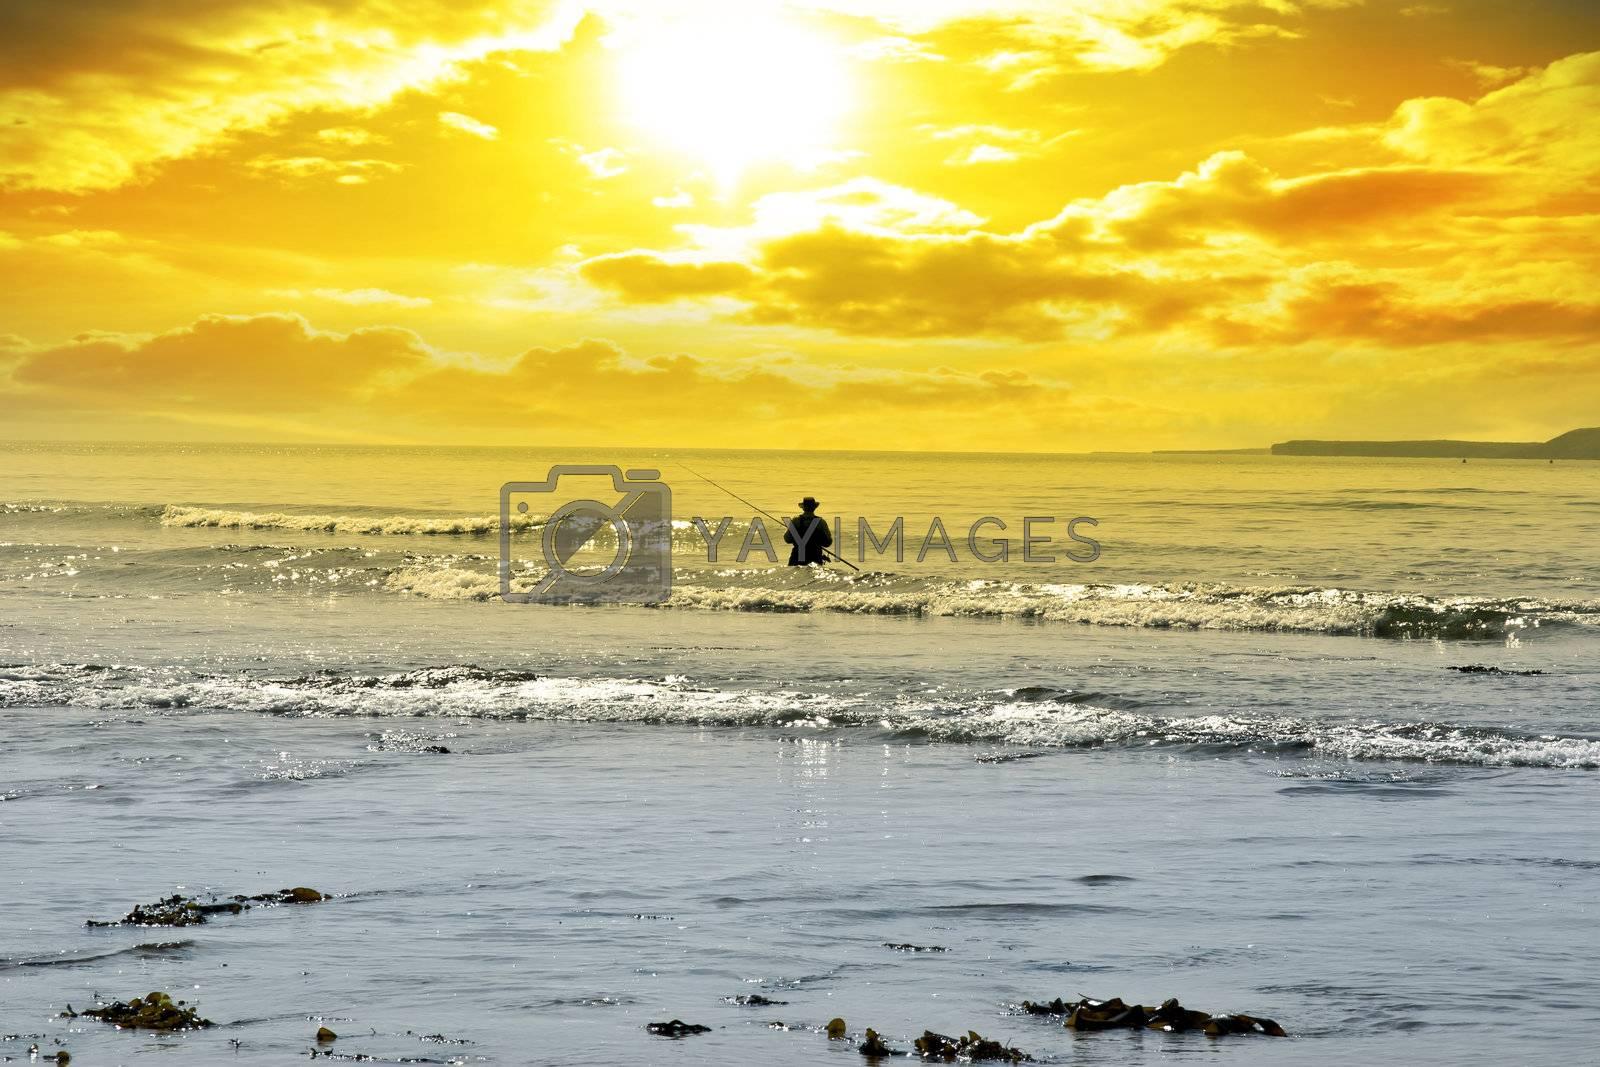 man fishing among the waves of the Atlantic ocean in Ballybunion county Kerry Ireland